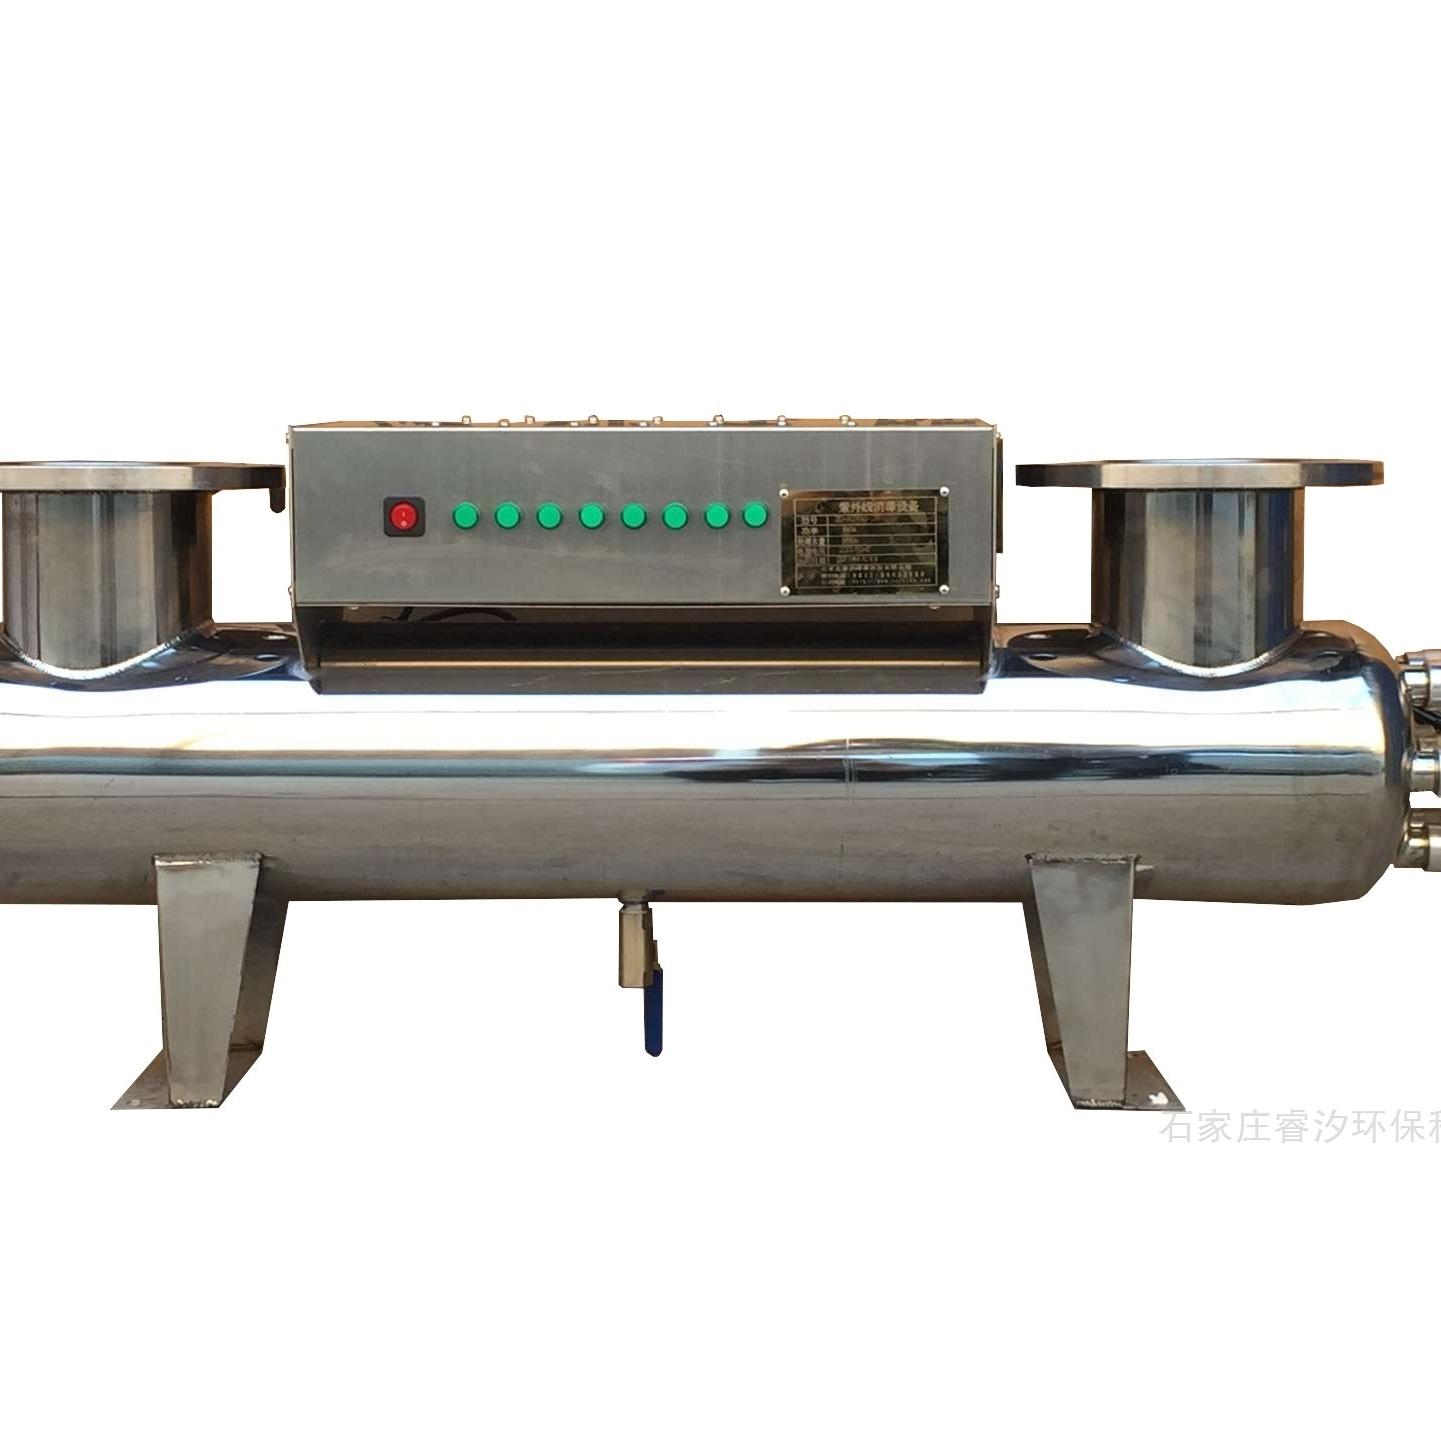 RZ-UV2-DH75FW紫外线消毒器